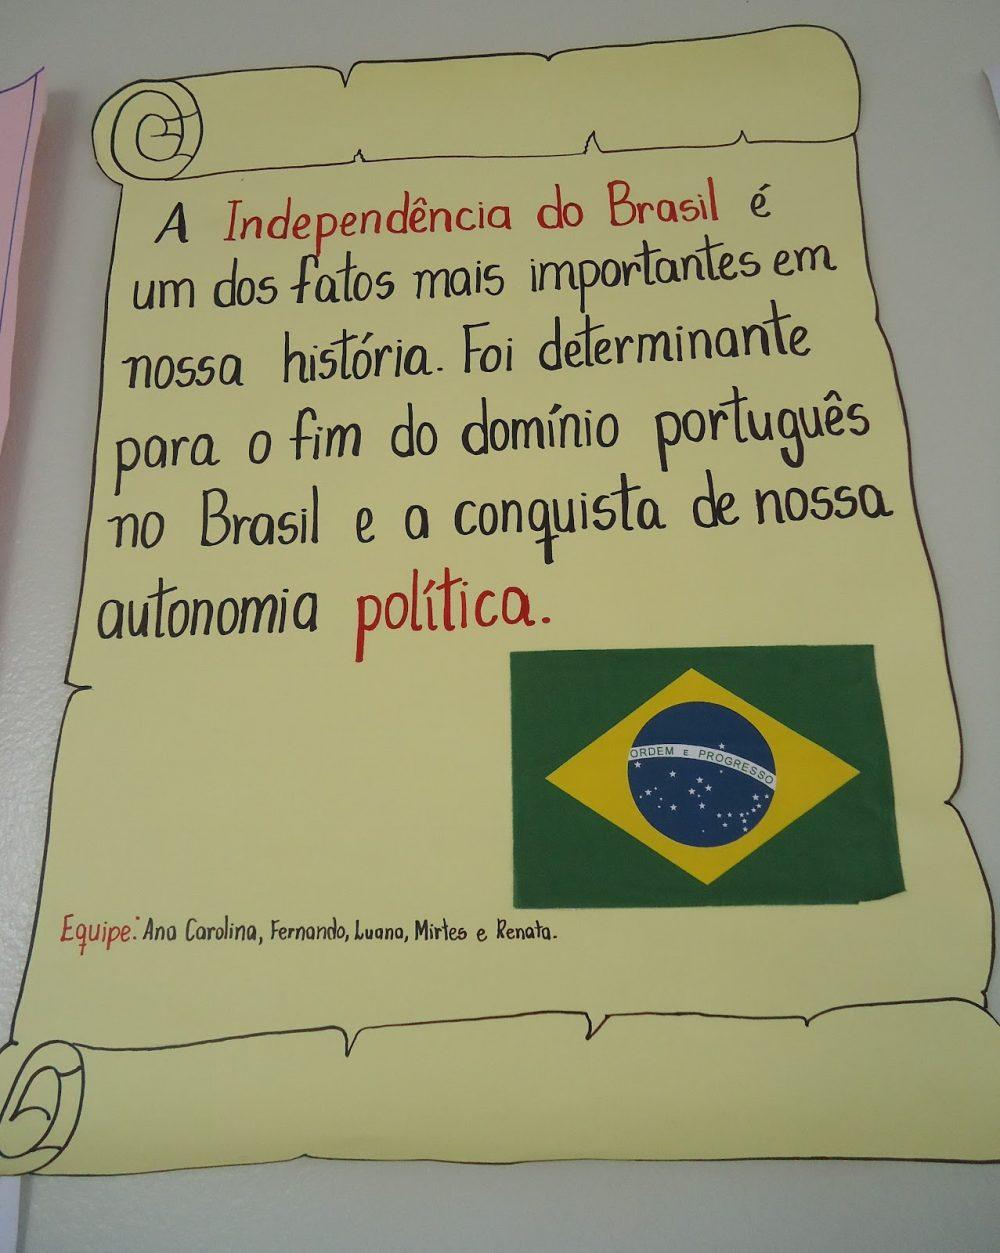 Cartaz Independência do Brasil